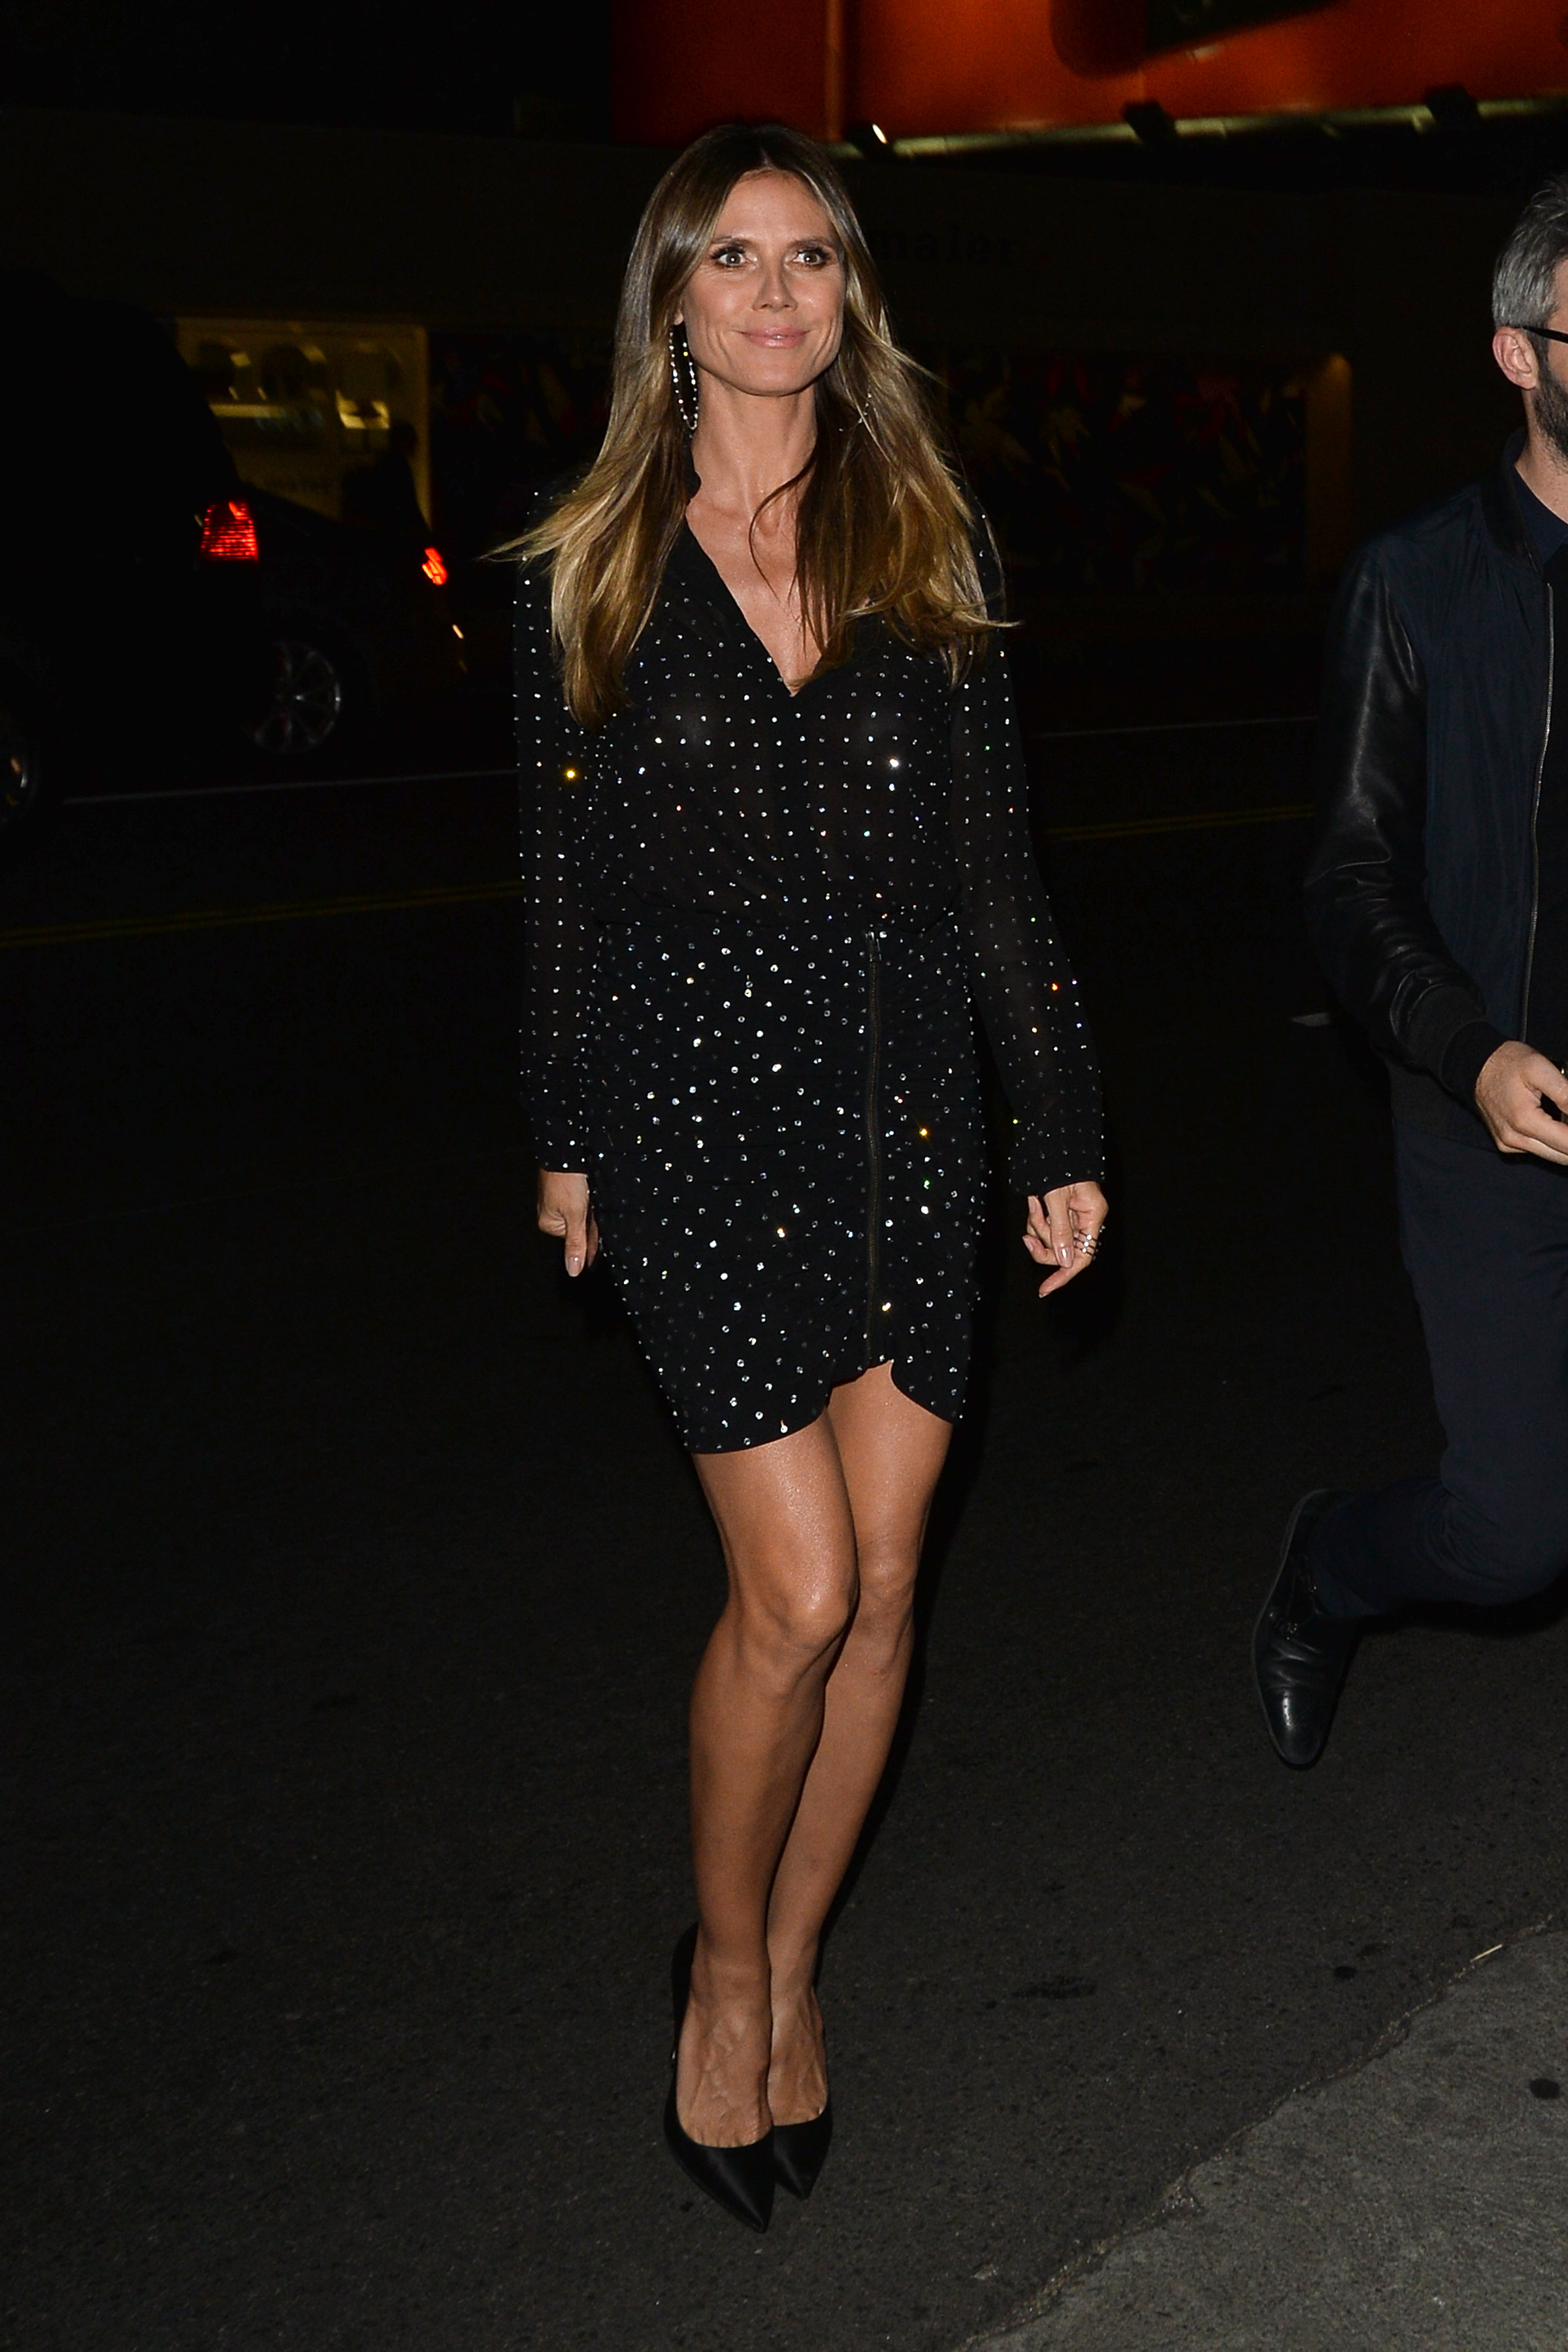 Heidi Klum Leaves The DundasWorld Store Opening <P> Pictured: Heidi Klum <B>Ref: SPL1687616  240418  </B><BR/> Picture by: Splash News<BR/> </P><P> <B>Splash News and Pictures</B><BR/> Los Angeles:310-821-2666<BR/> New York:212-619-2666<BR/> London:870-934-2666<BR/> <span id=